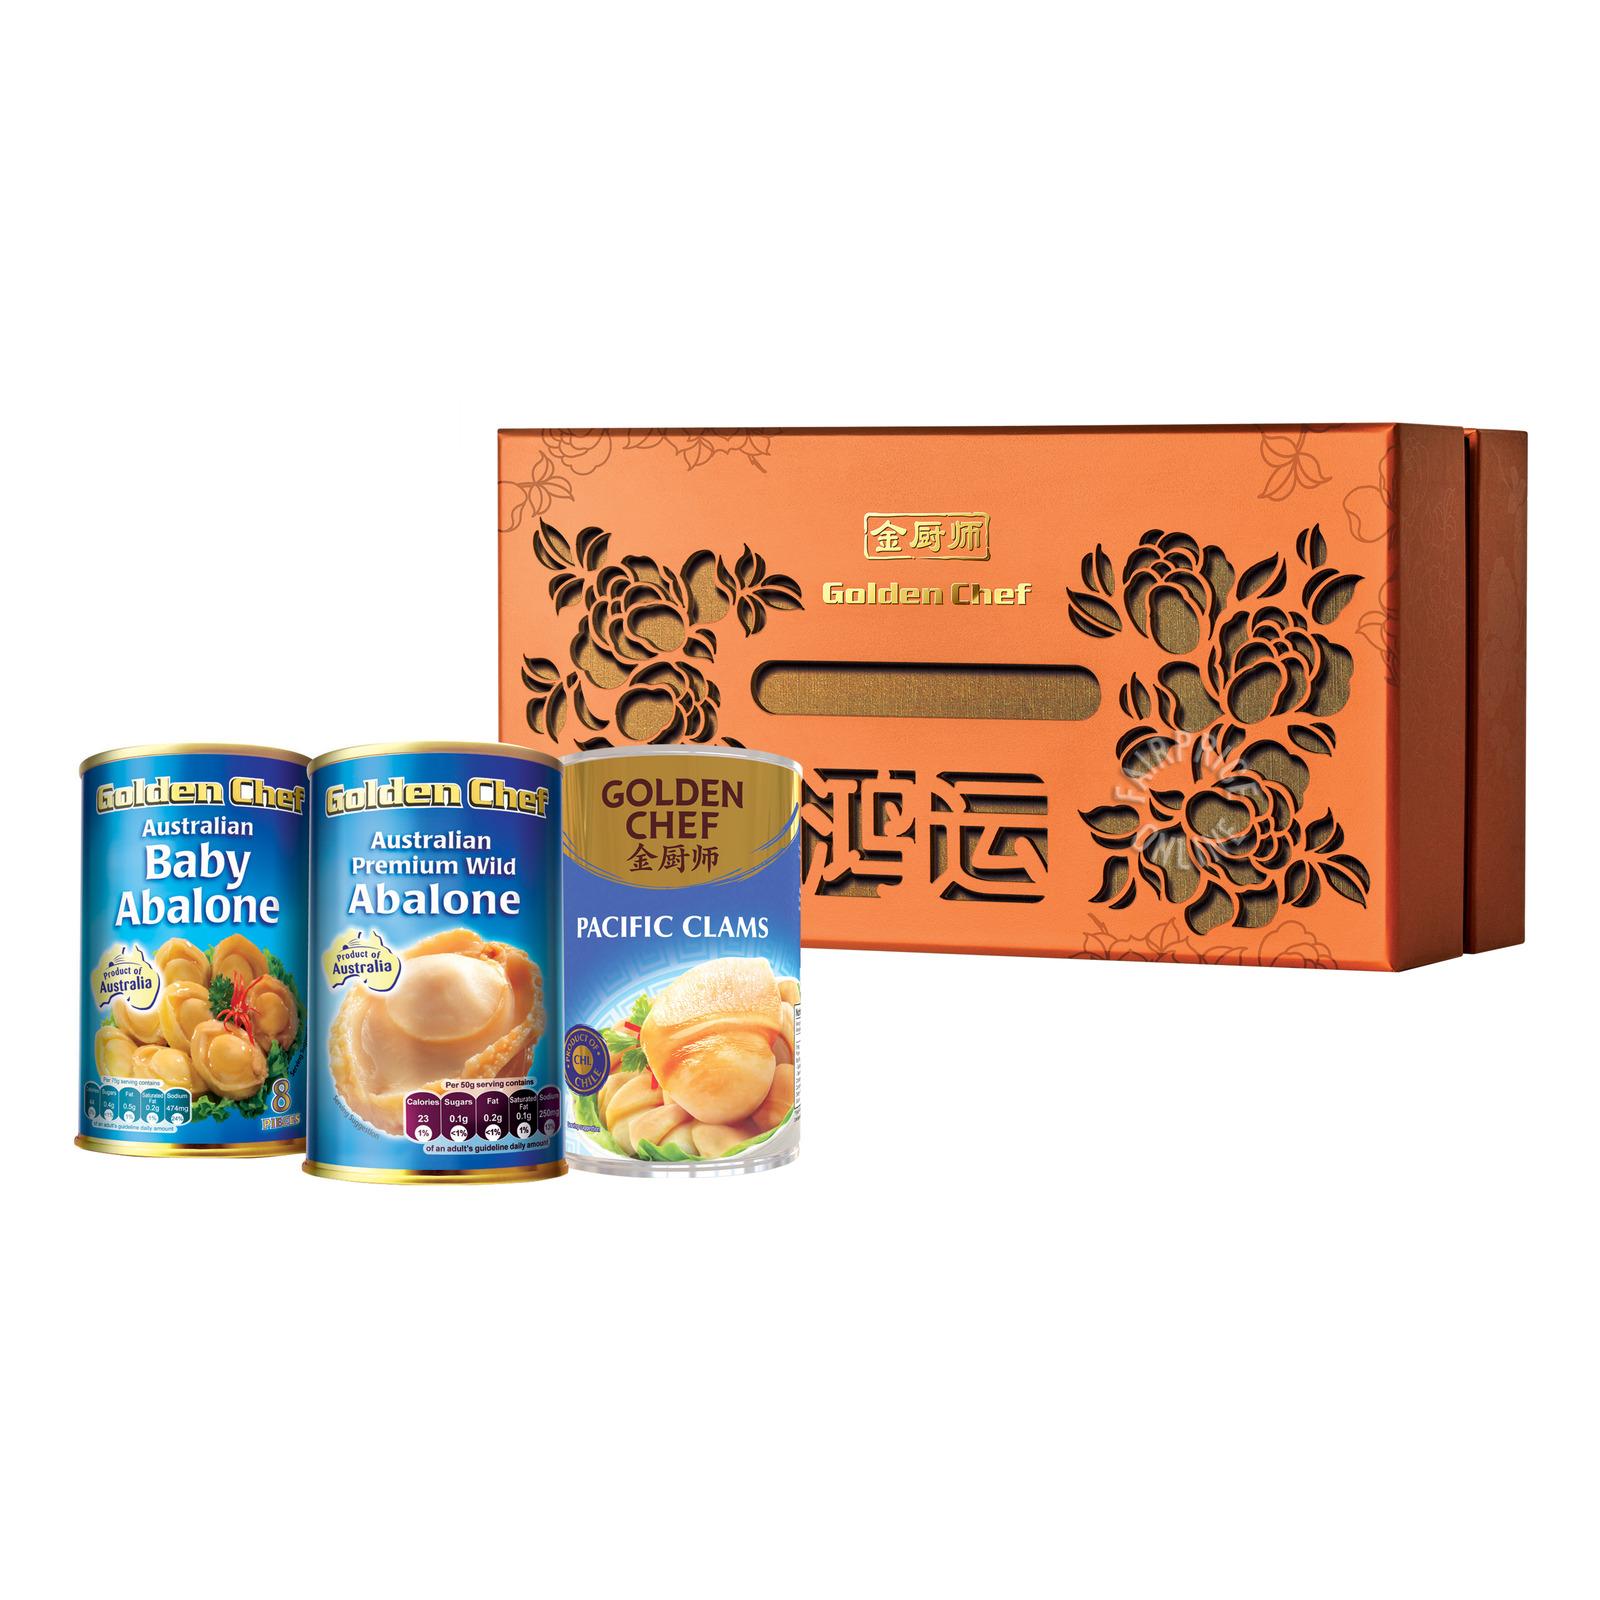 Golden Chef Gift Set - Prosperity